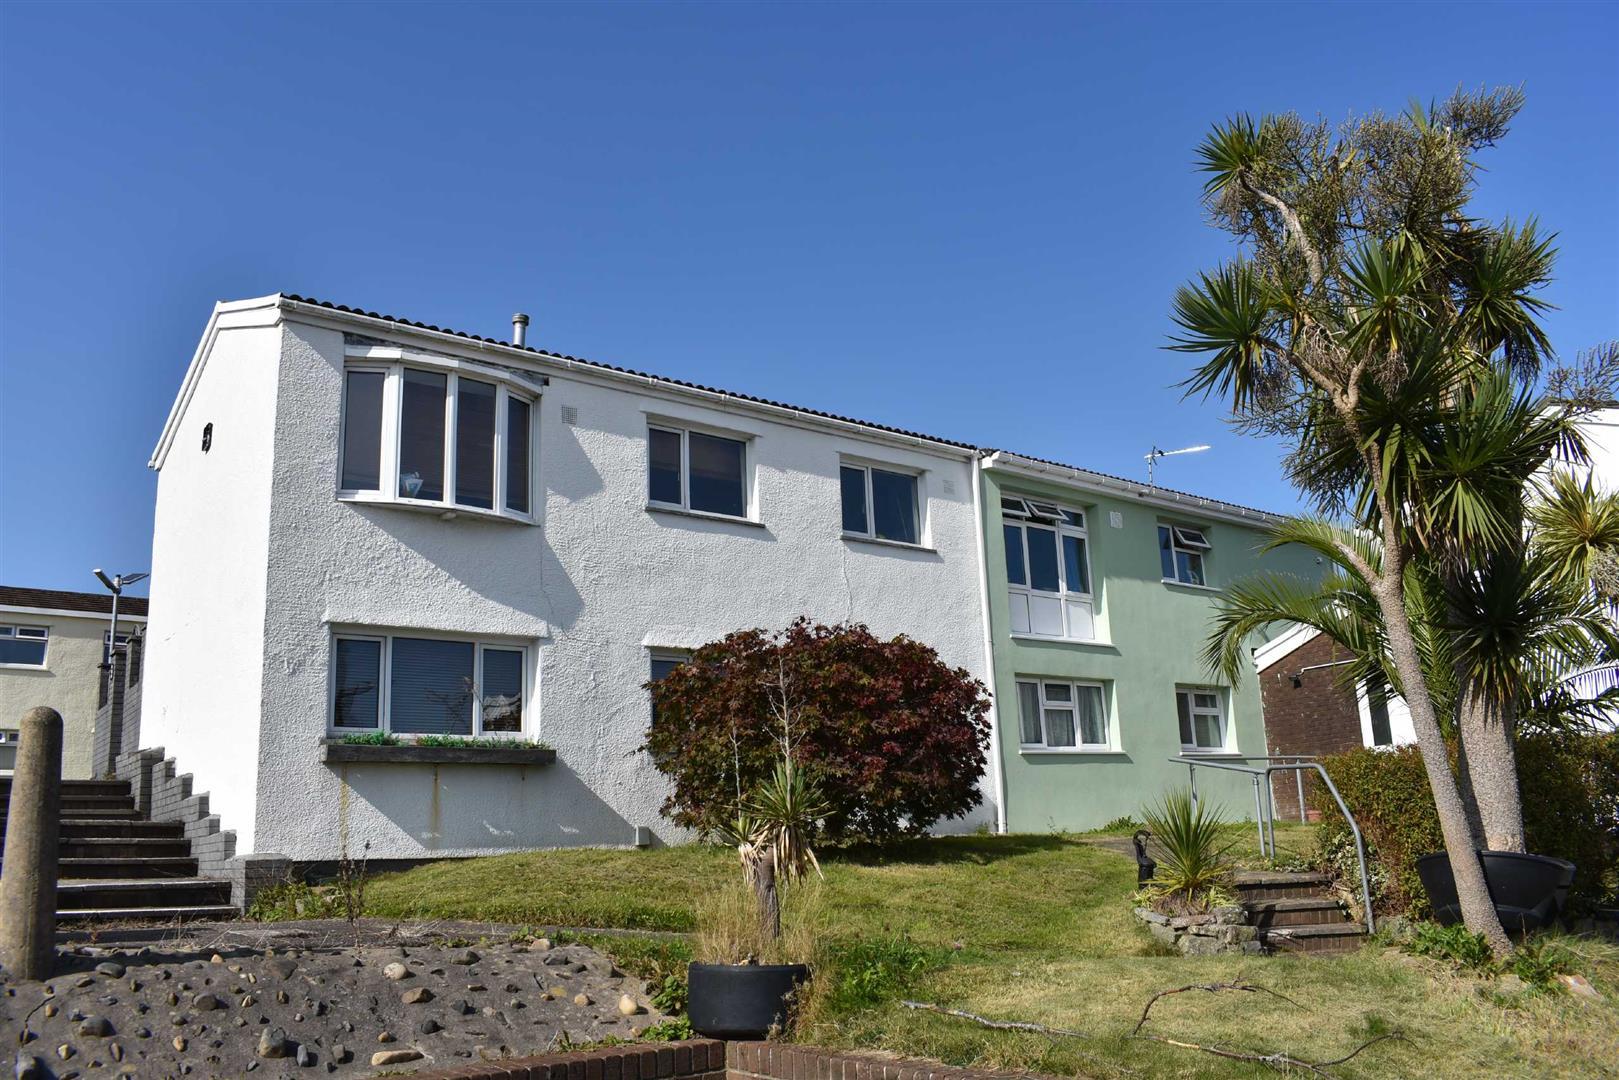 Illston Way, West Cross, Swansea, SA3 5LG